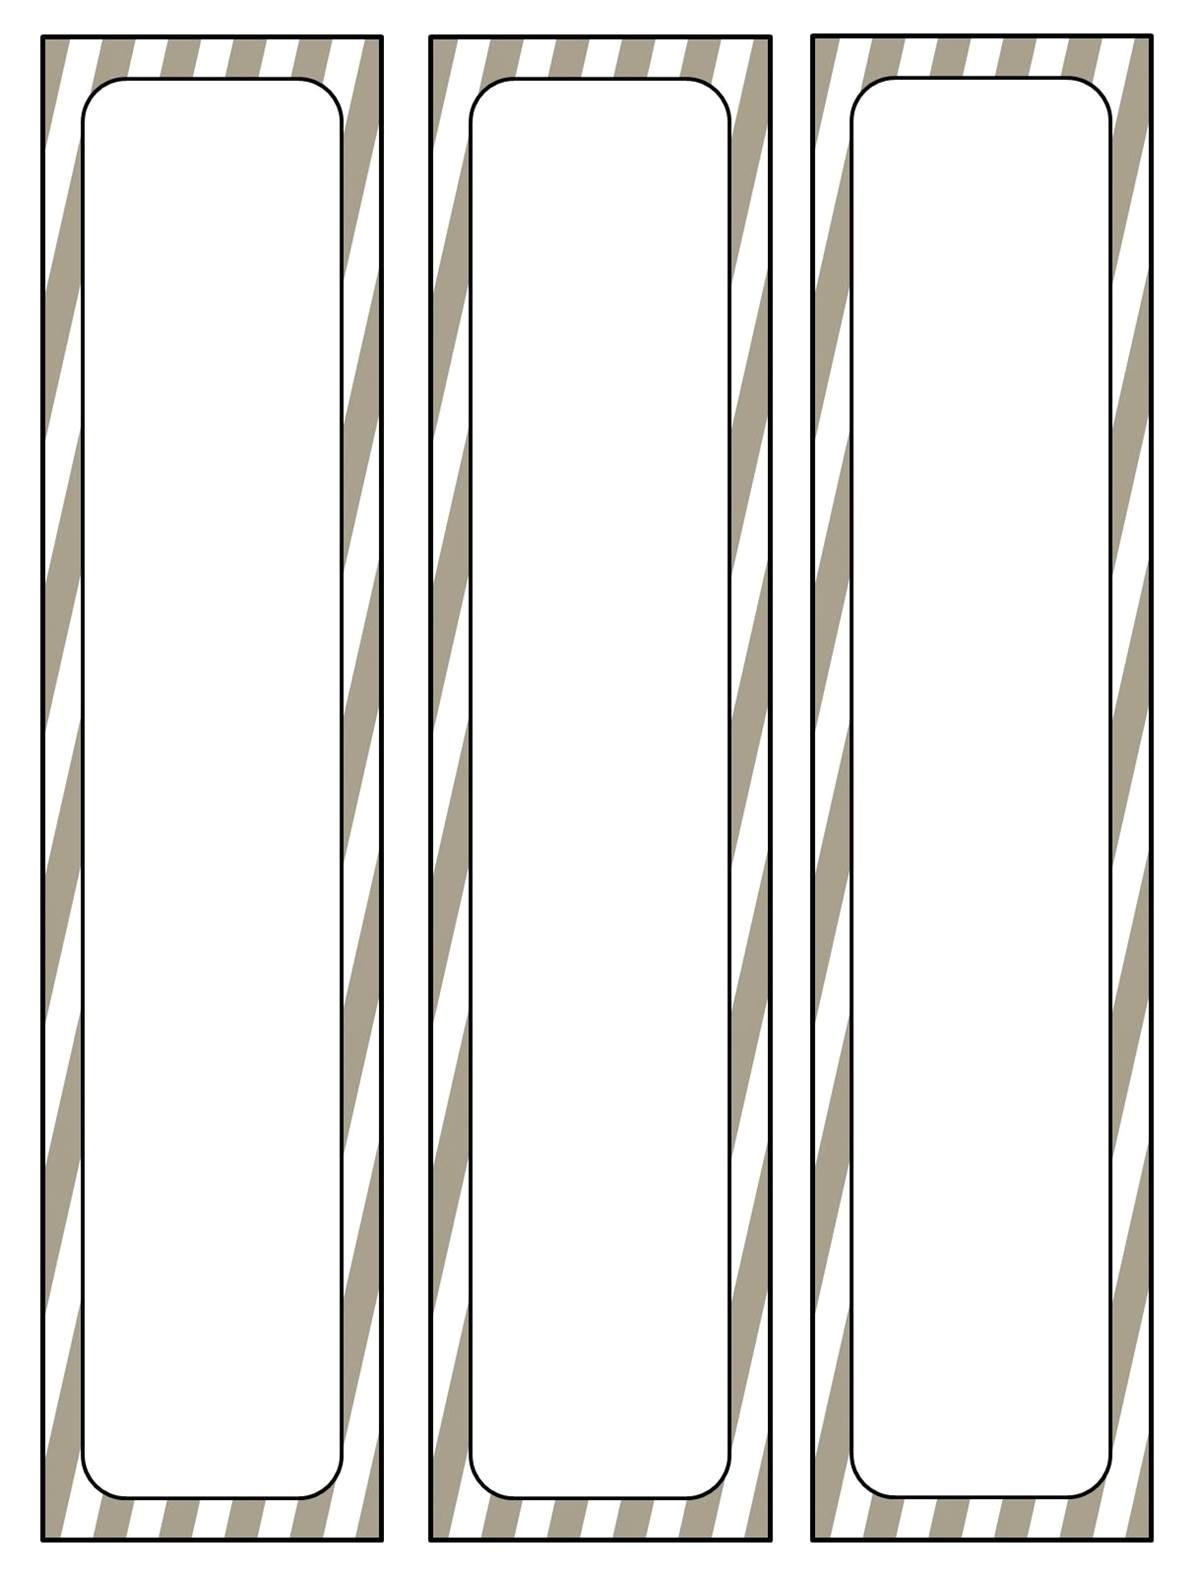 binder spine template